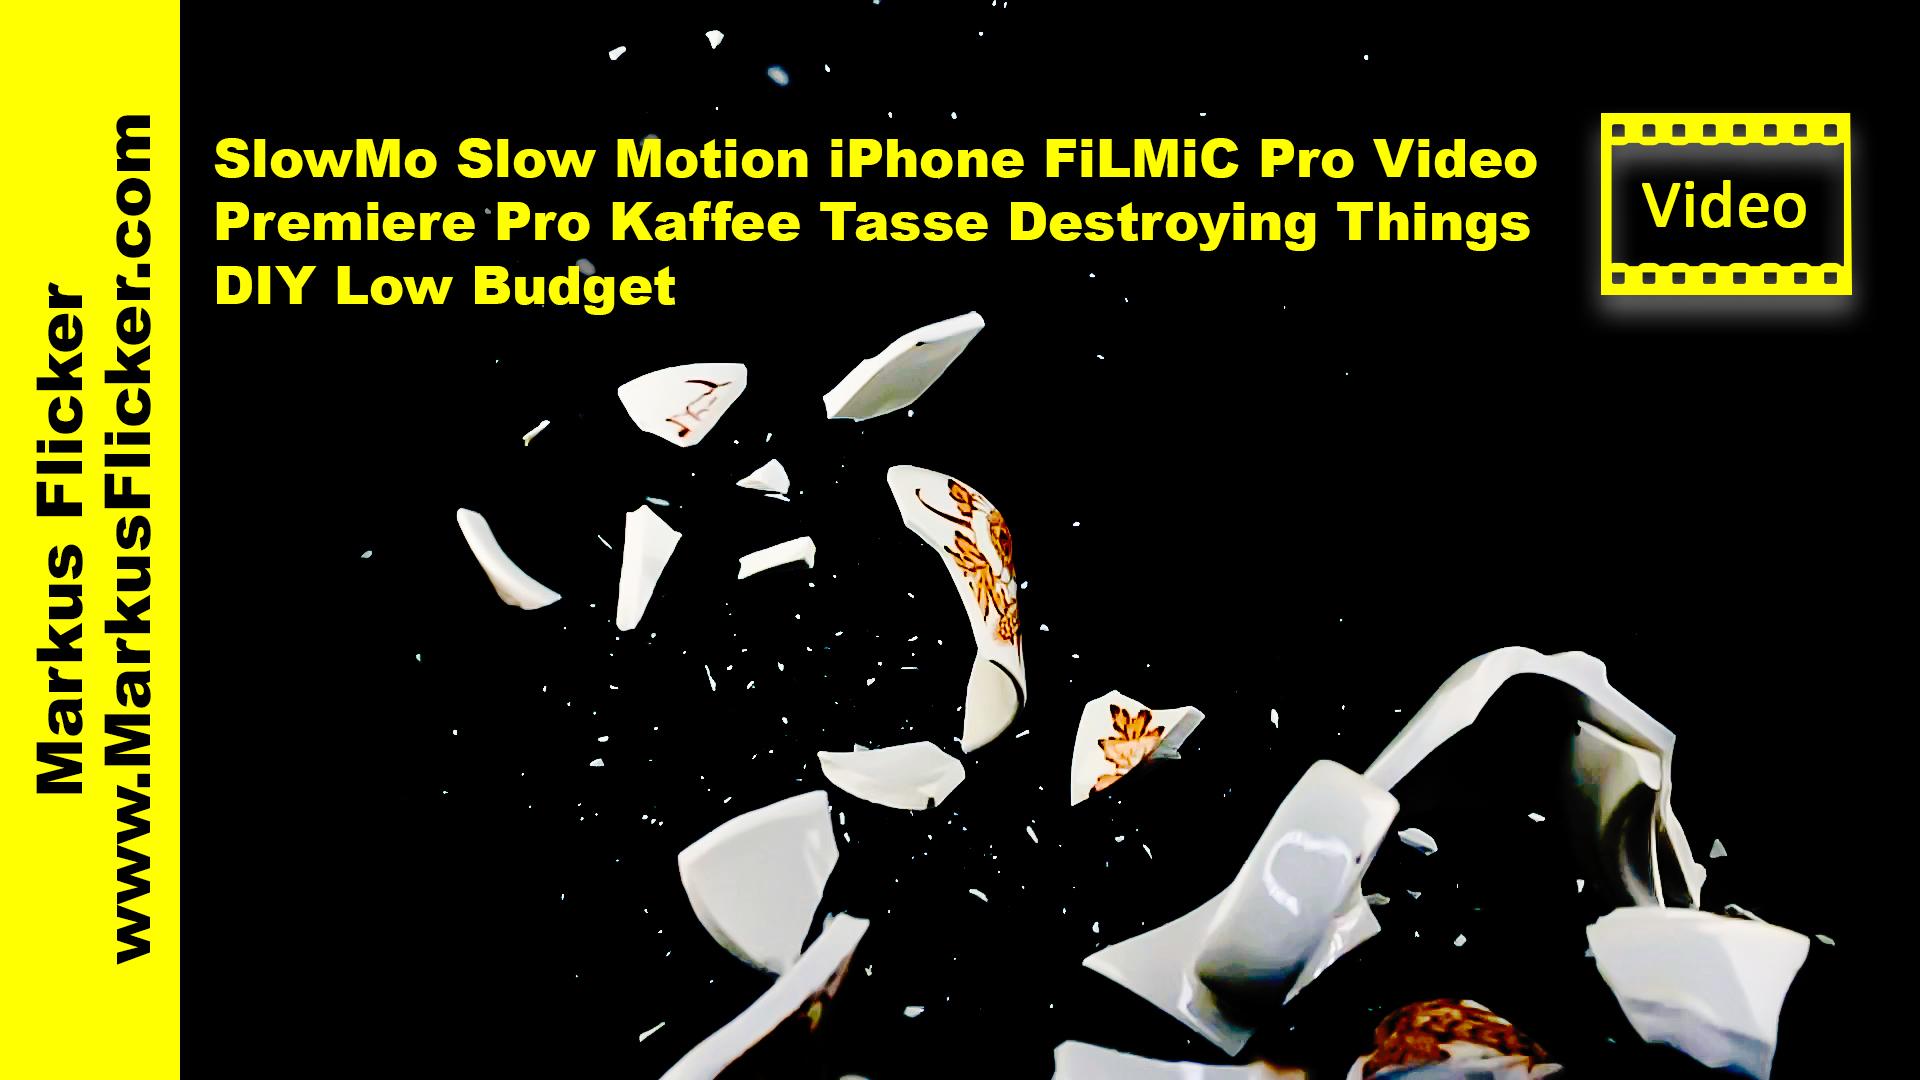 SlowMo Slow Motion iPhone FiLMiC Pro Video Premiere Pro Kaffee Tasse Destroying Things DIY Low Budget